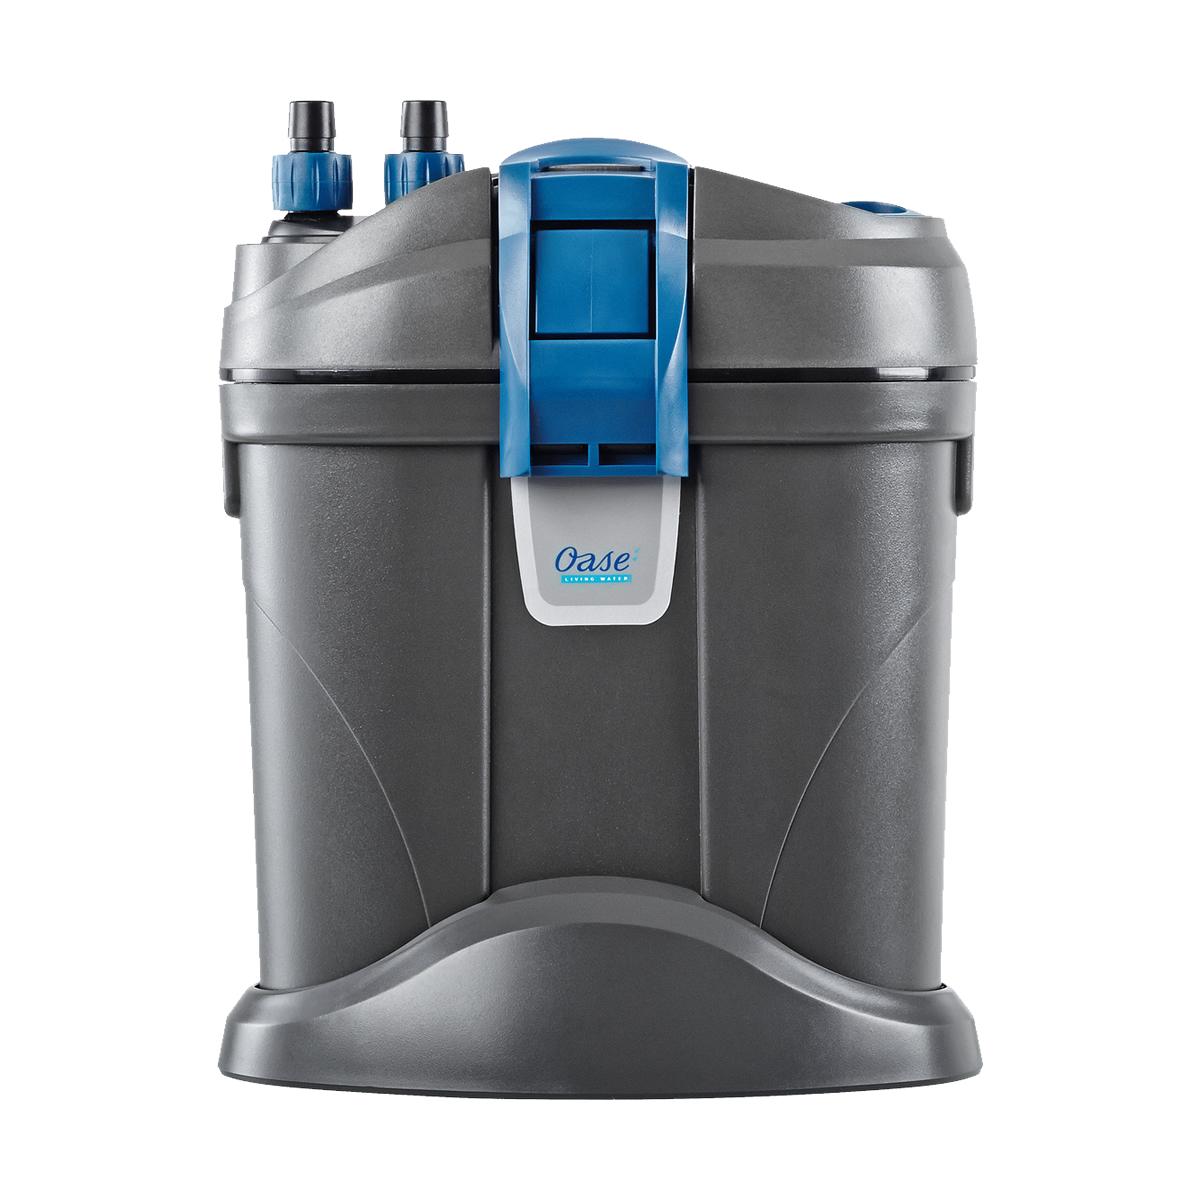 Oase FiltoSmart 100 Mini / Nano Canister filter 11W 600 L/H